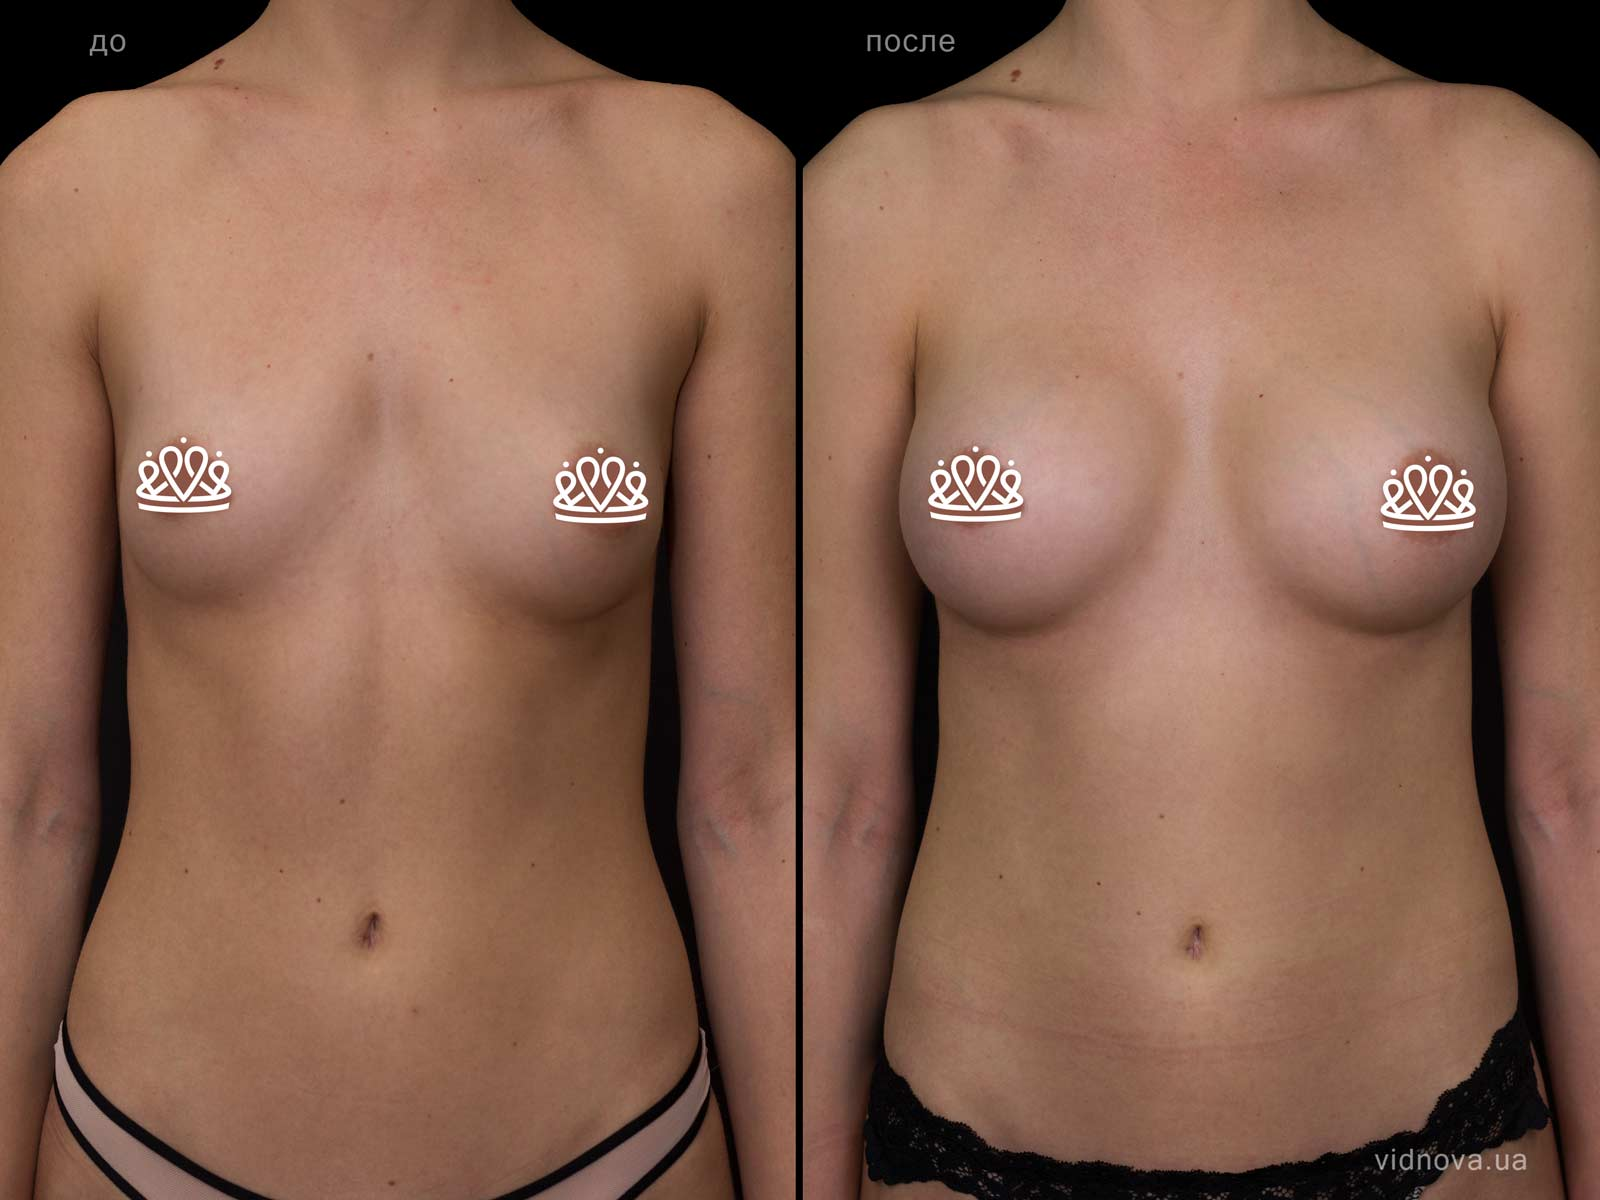 Увеличение груди 1s 12